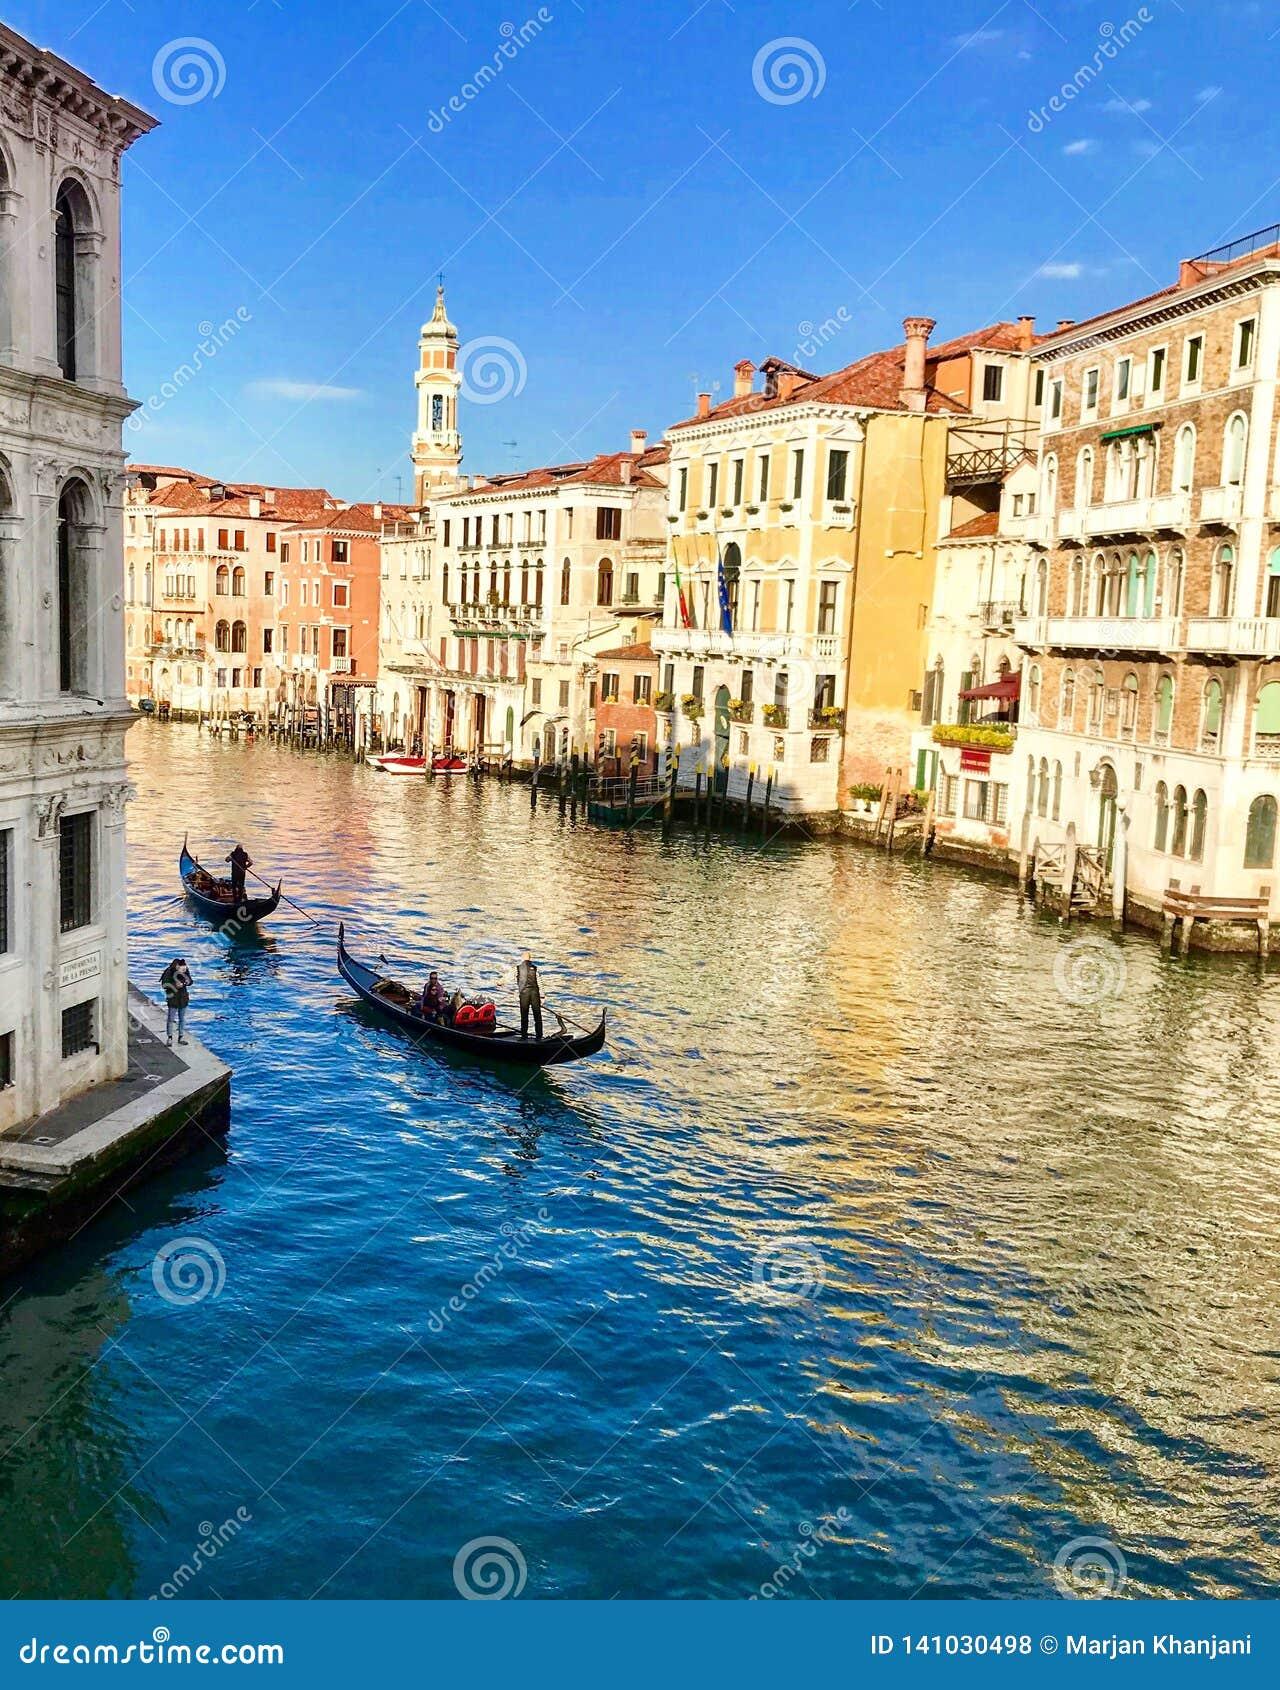 Der Kanal groß in Venedig, Italien